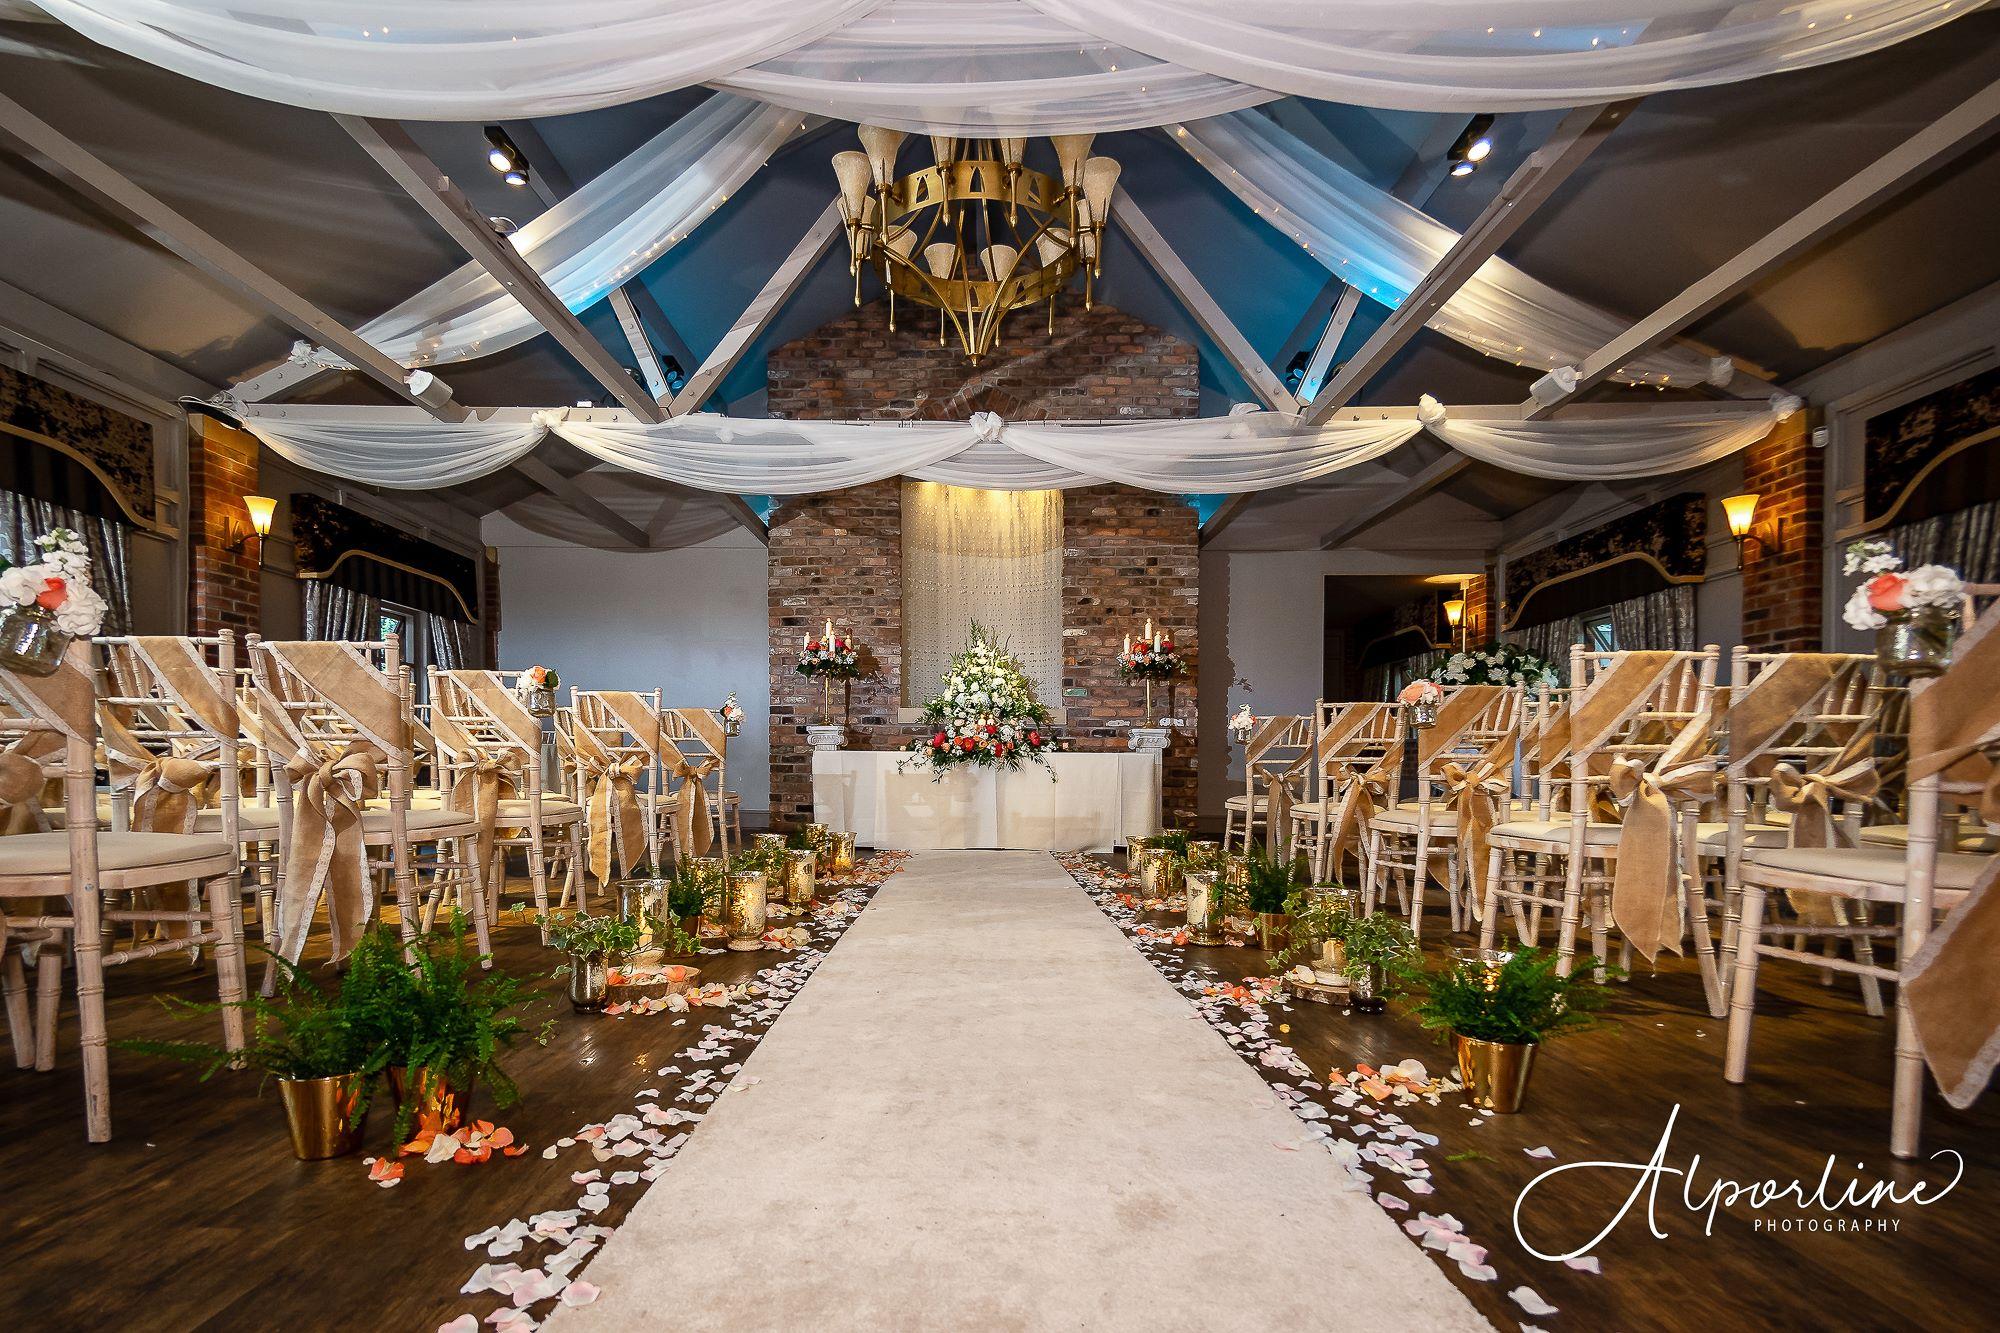 Bartle-Hall-hotel-wedding-photograph-preston-wedding-photographer.jpg